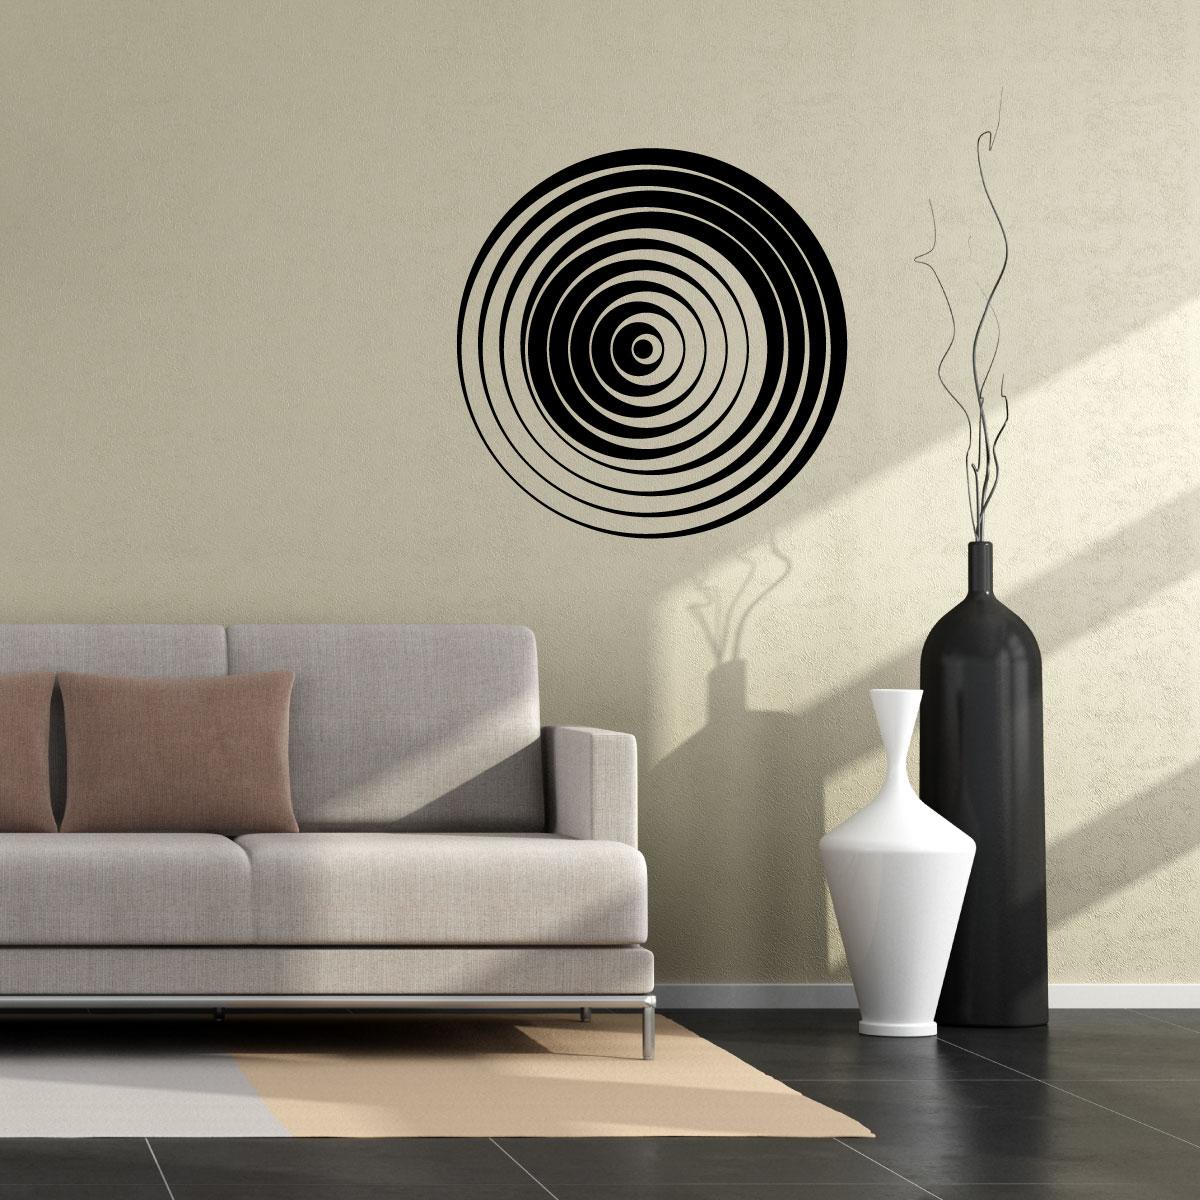 stickers muraux design sticker mural illusion d 39 optique 7 ambiance. Black Bedroom Furniture Sets. Home Design Ideas